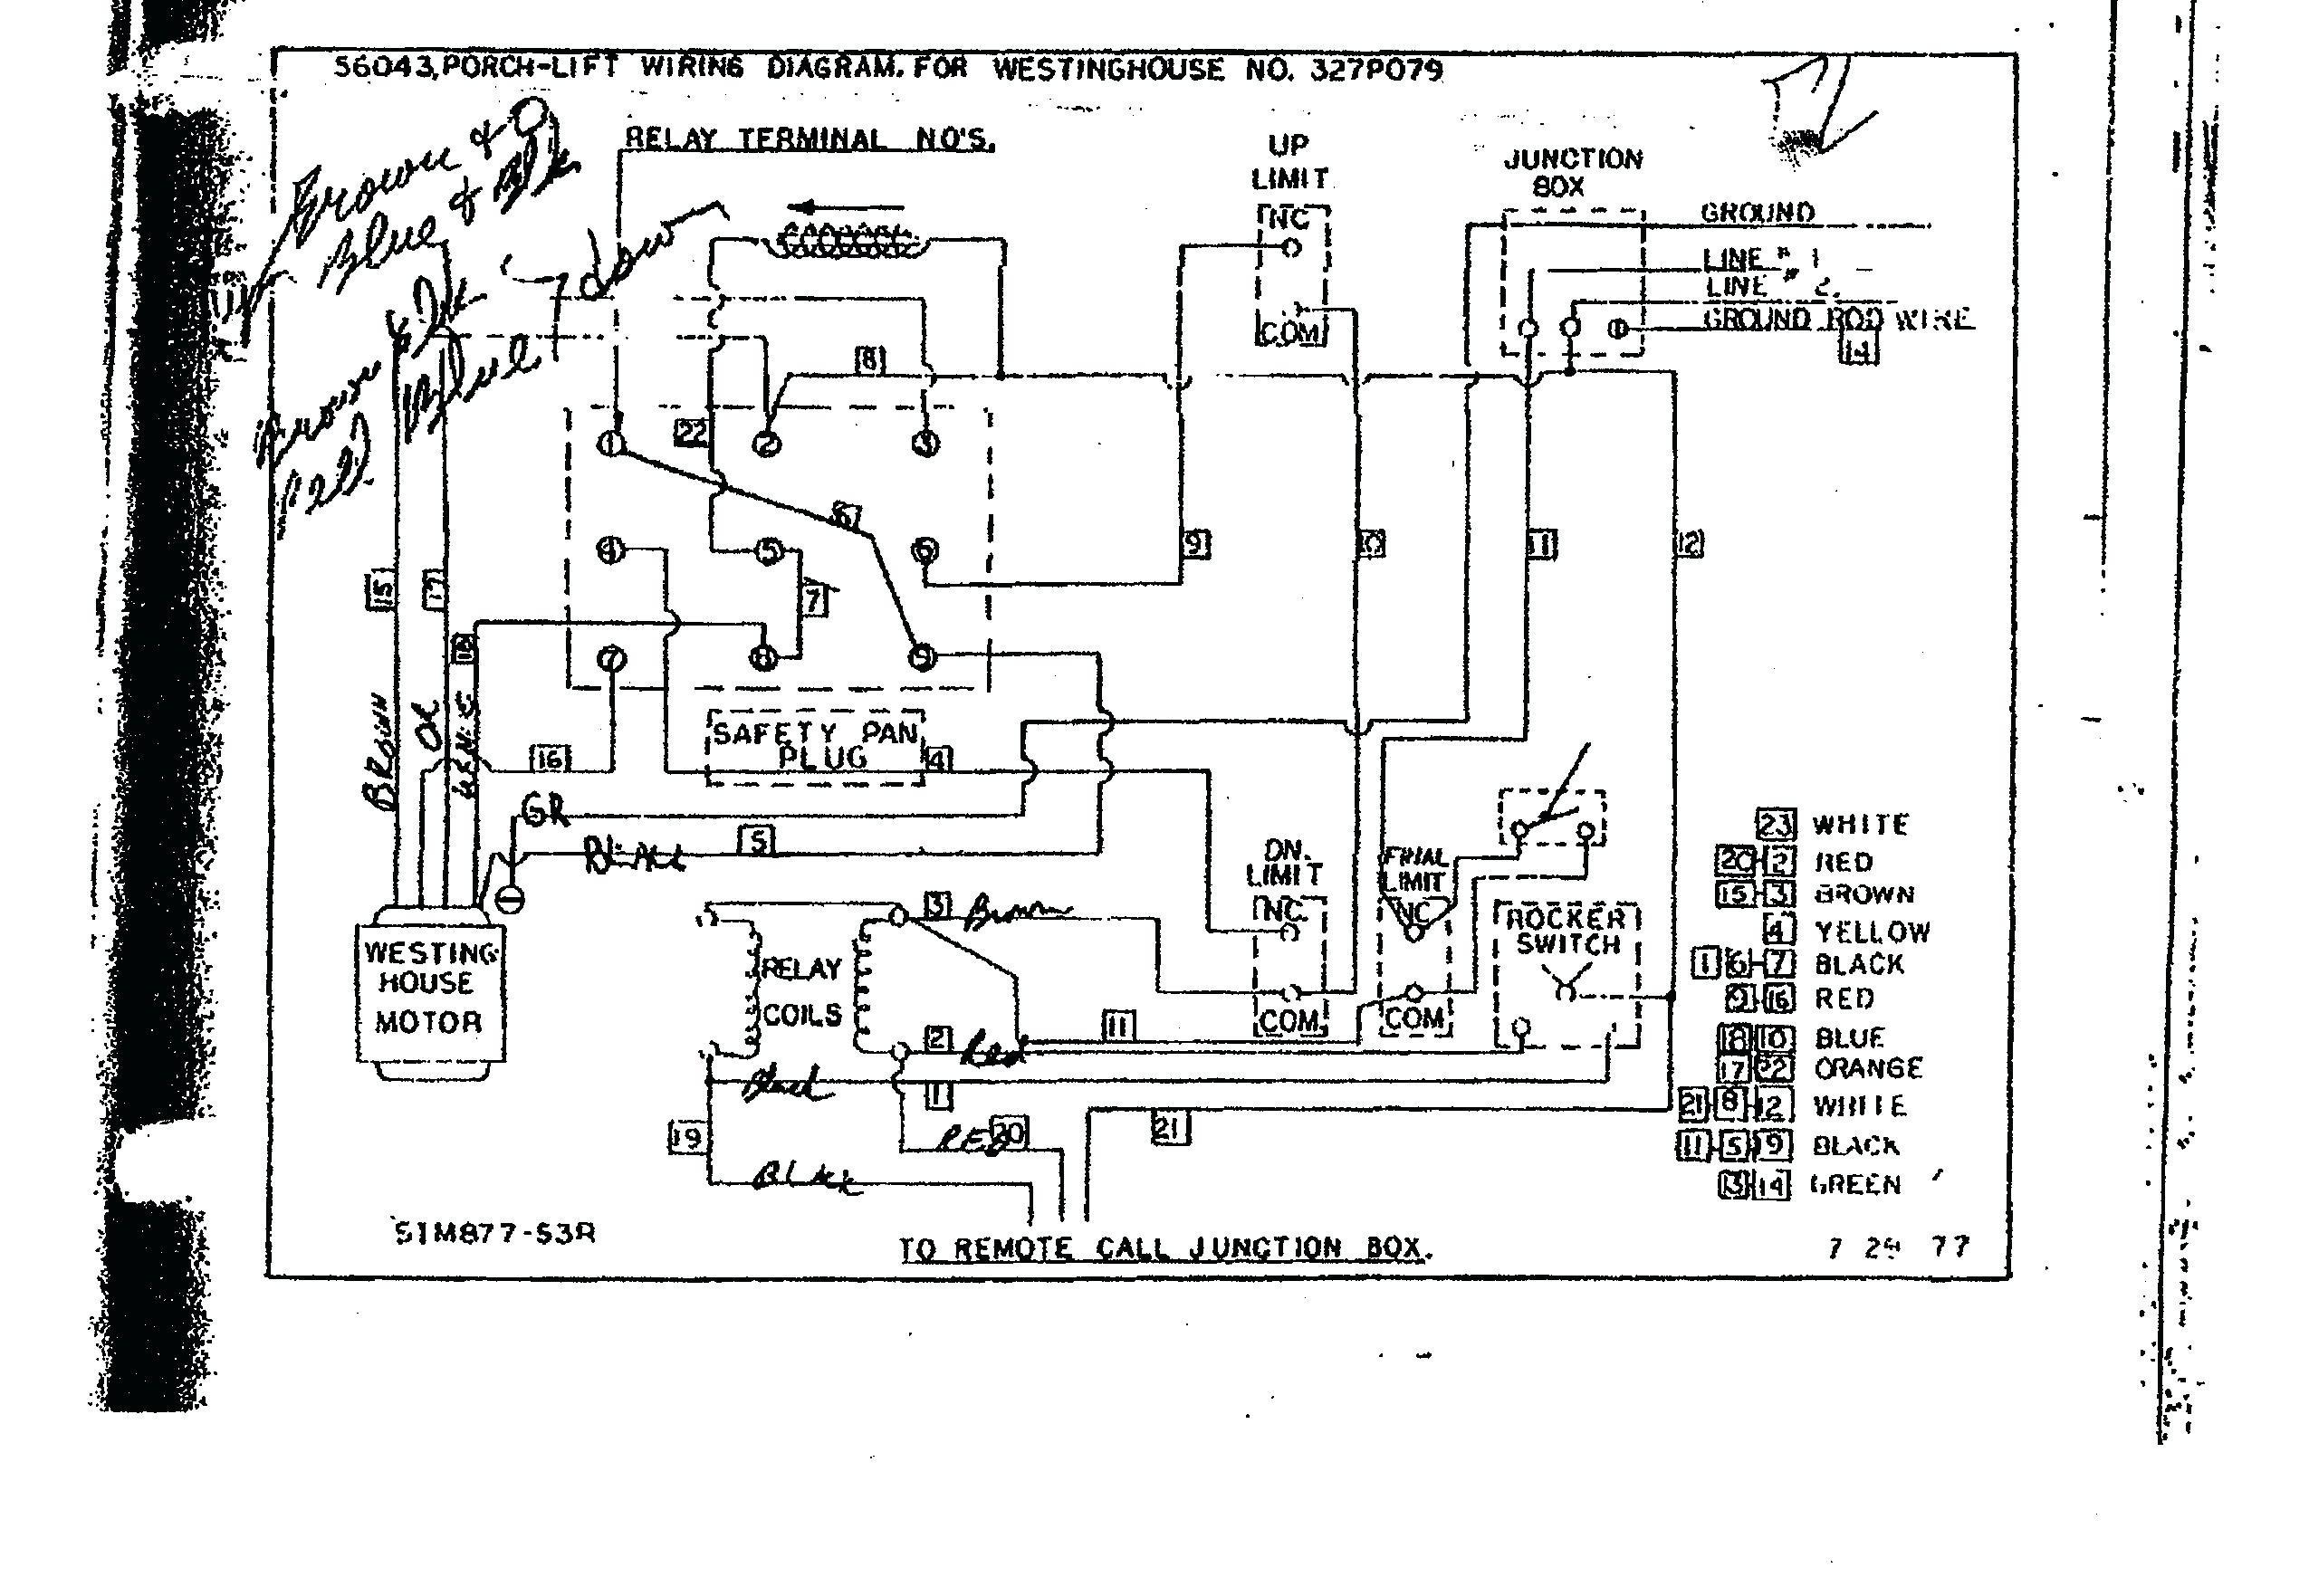 hx_4674] century dl1036 furnace blower wiring diagram free diagram  atolo alia onica knie dict vira mohammedshrine librar wiring 101